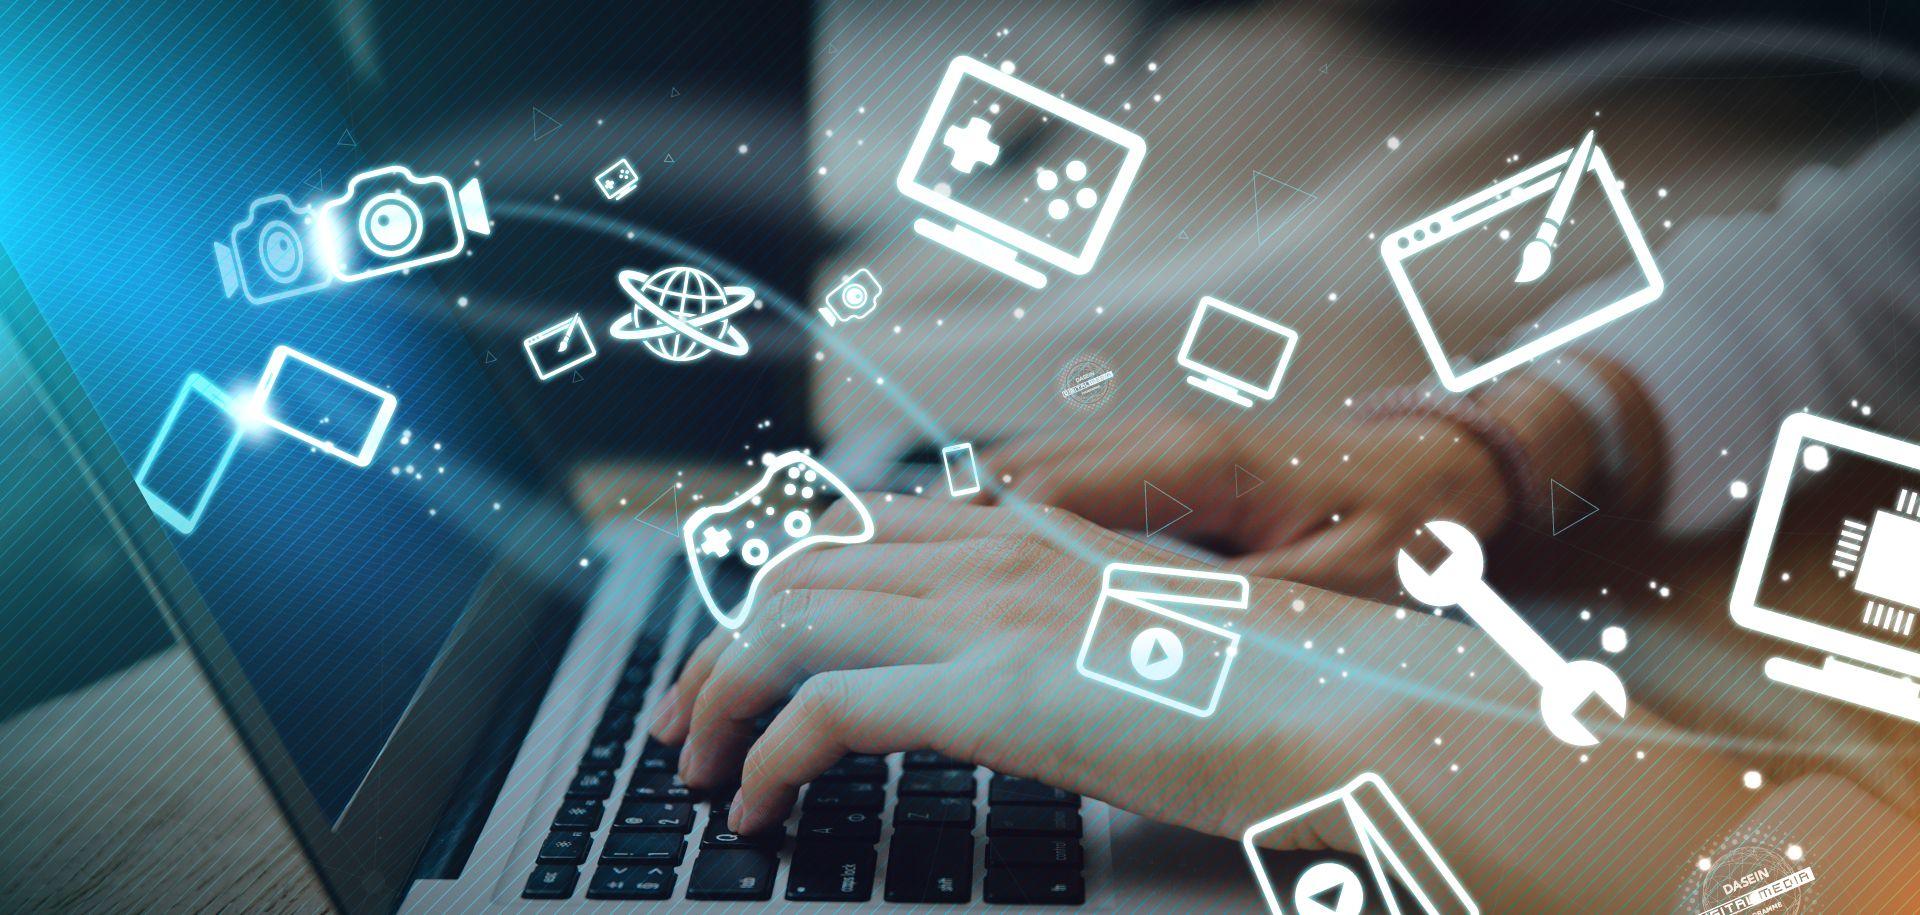 Pengertian Contoh dan Aplikasi Pembuat Multimedia Pembelajaran Interaktif